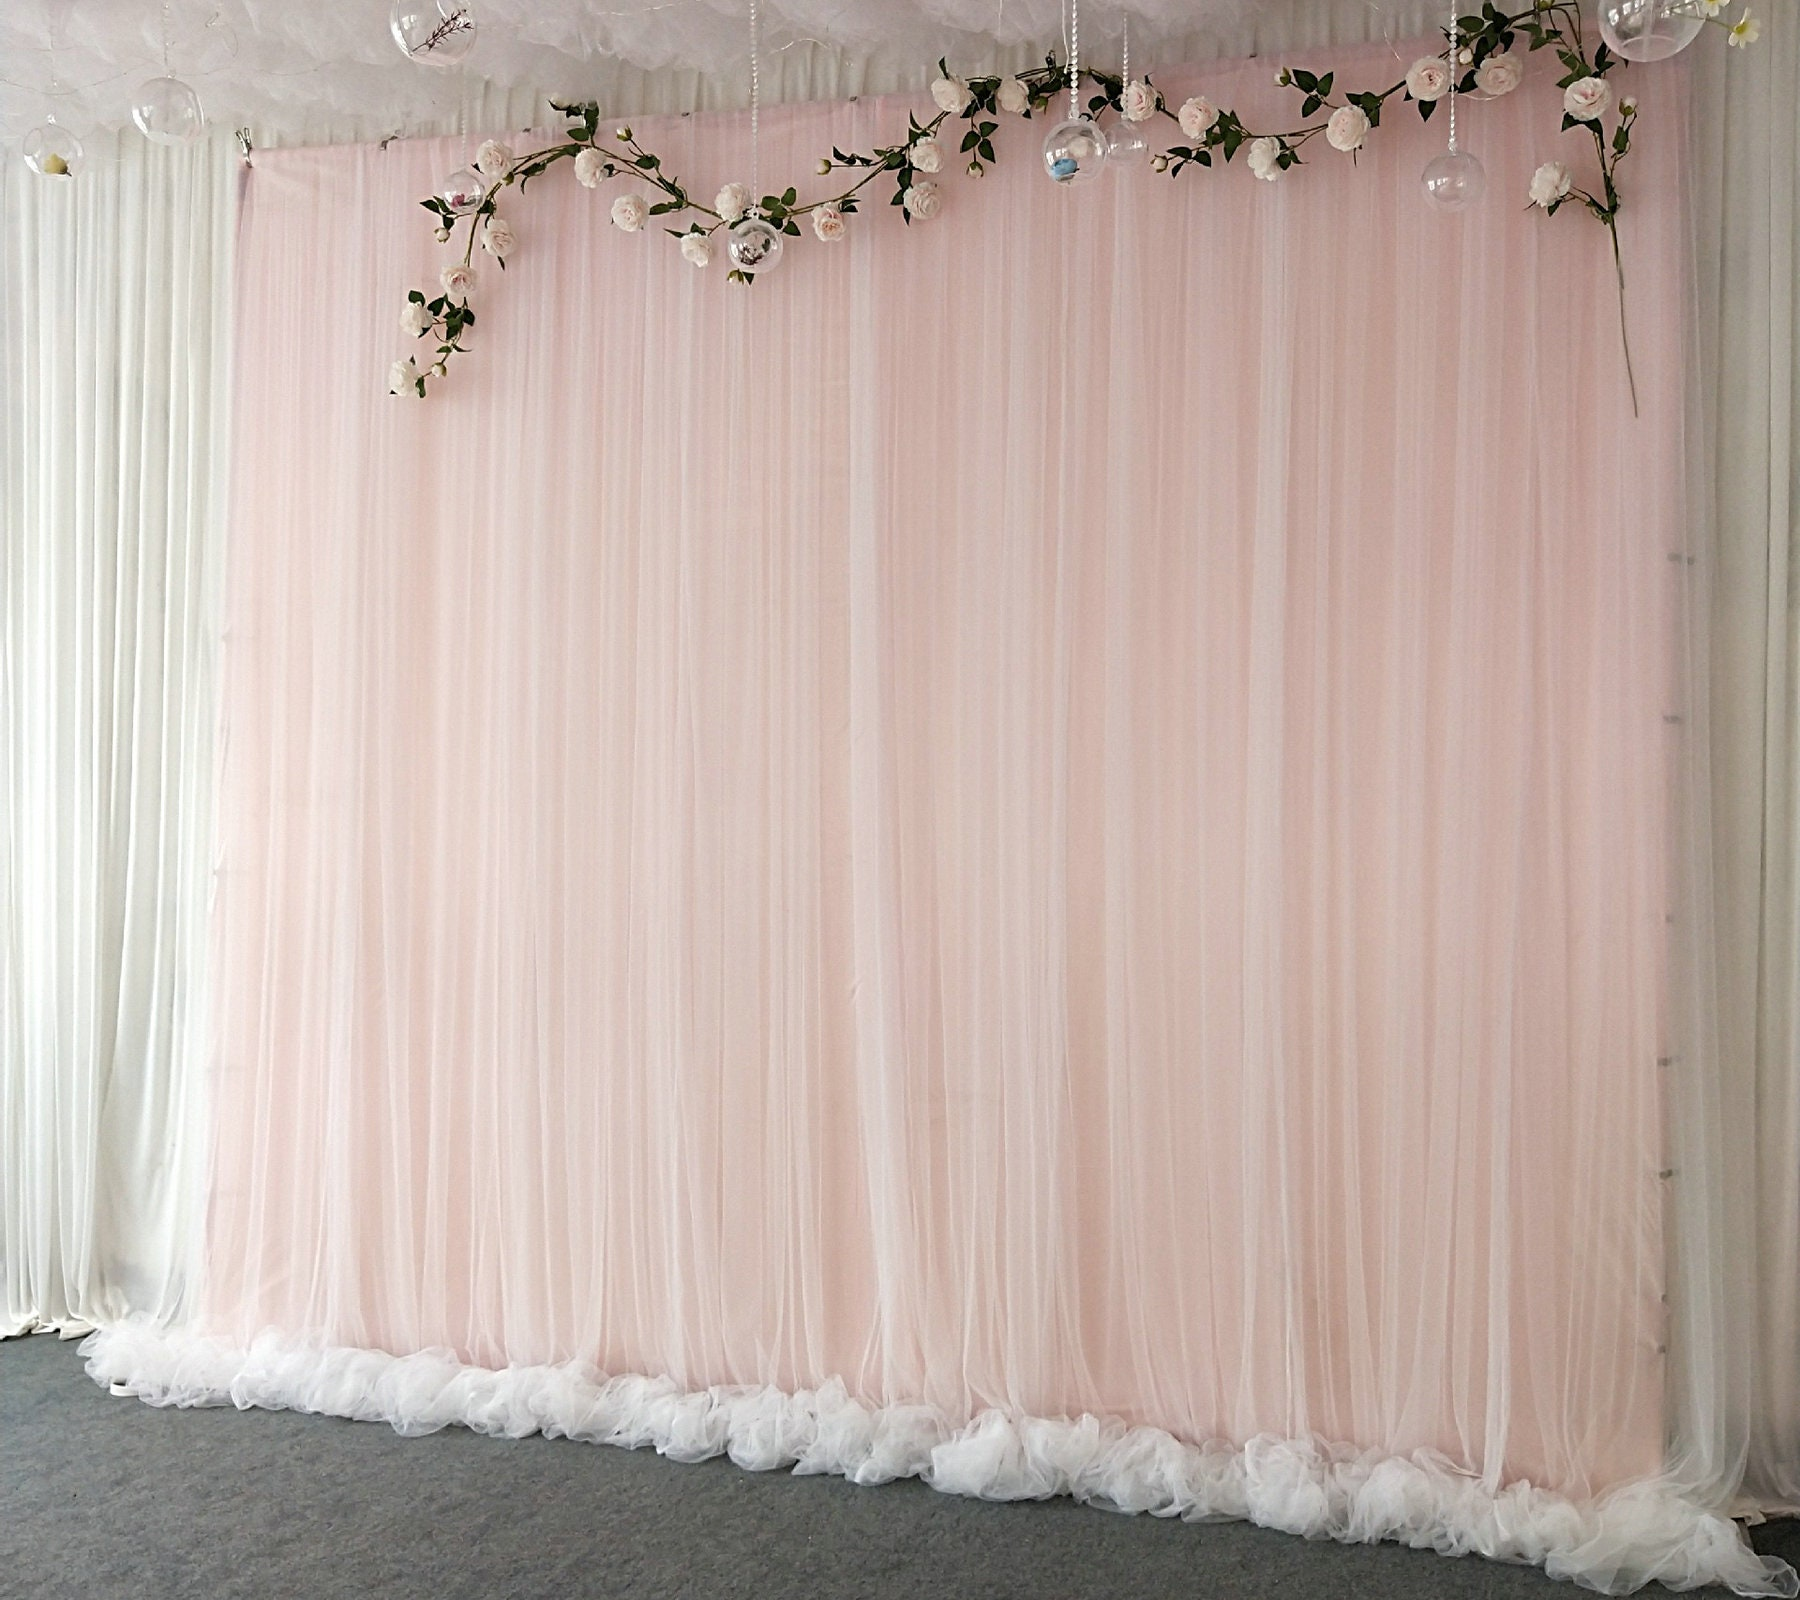 Light Pink Tulle Wedding Backdrop For Reception Romantic Full | Etsy